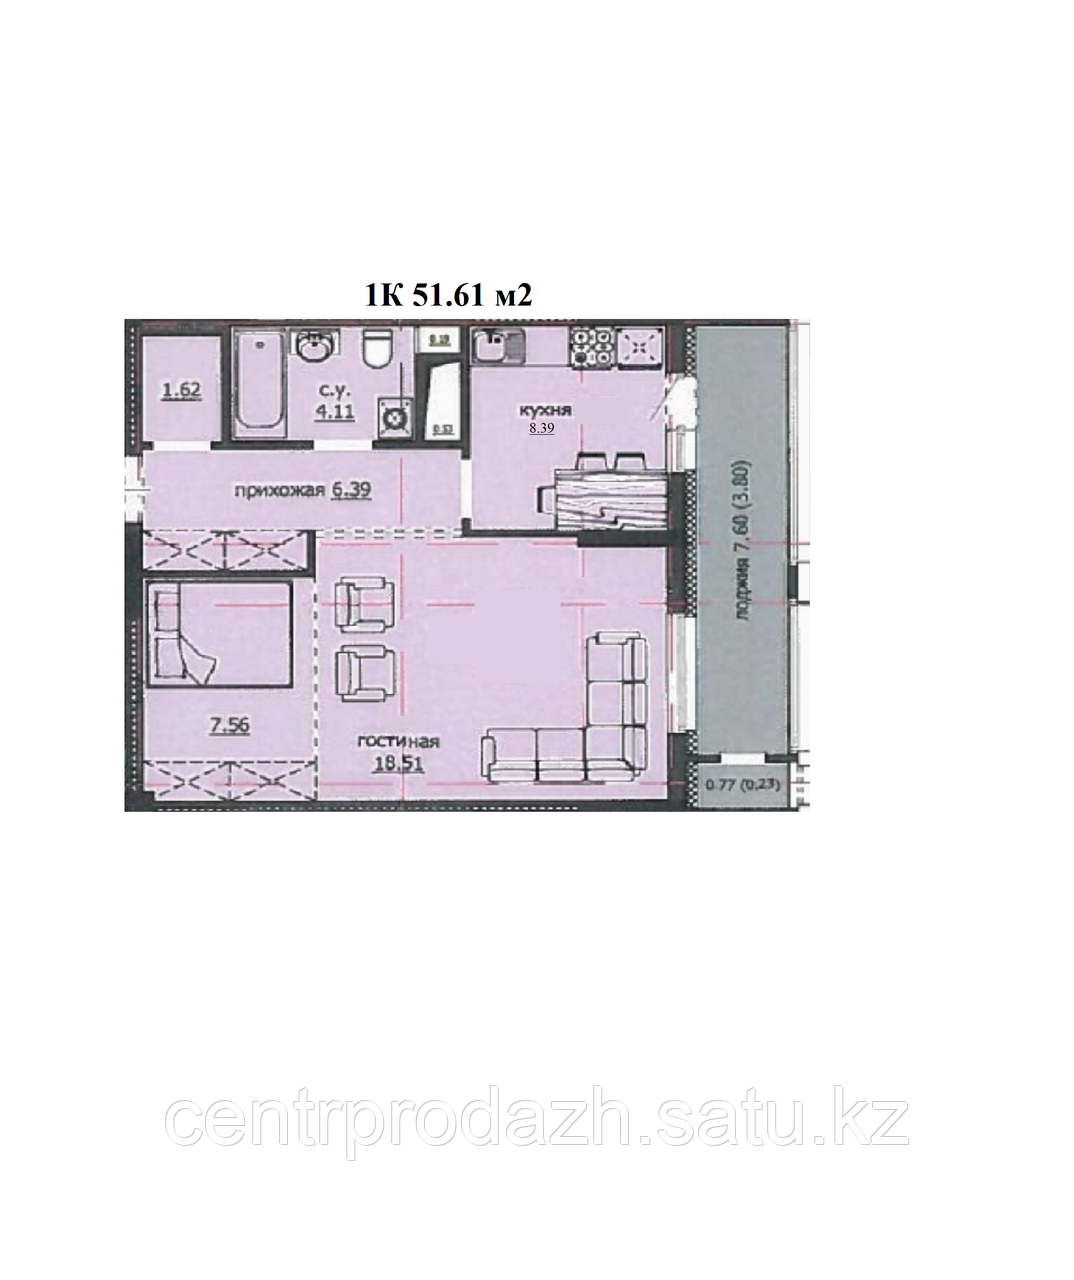 "1 комнатная квартира ЖК ""Аскер"" 51.61 м2"